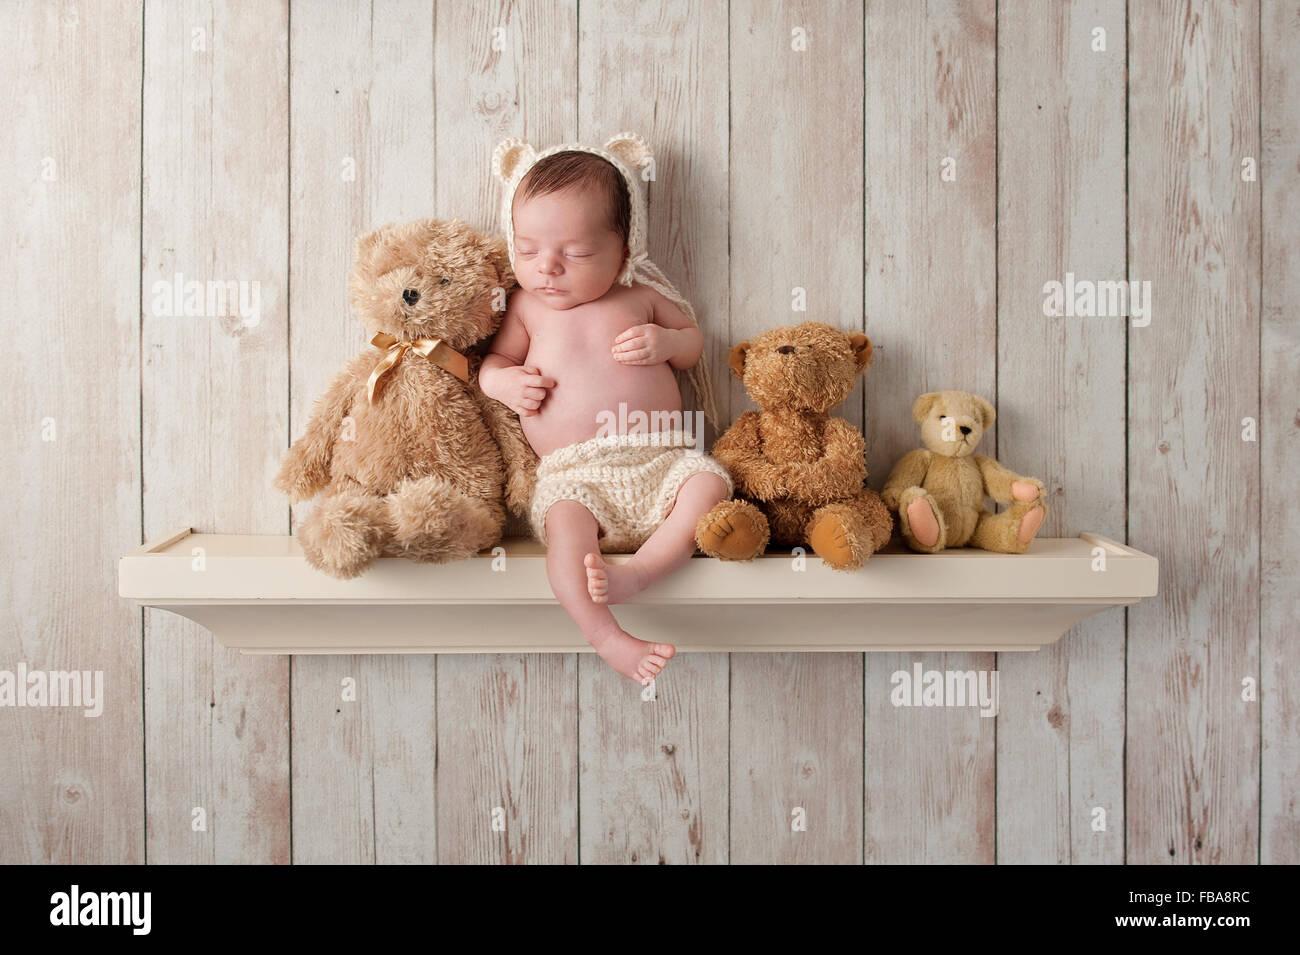 Three Week Old Newborn Baby Boy Wearing A Cream Colored Crocheted Bear Bonnet He Is